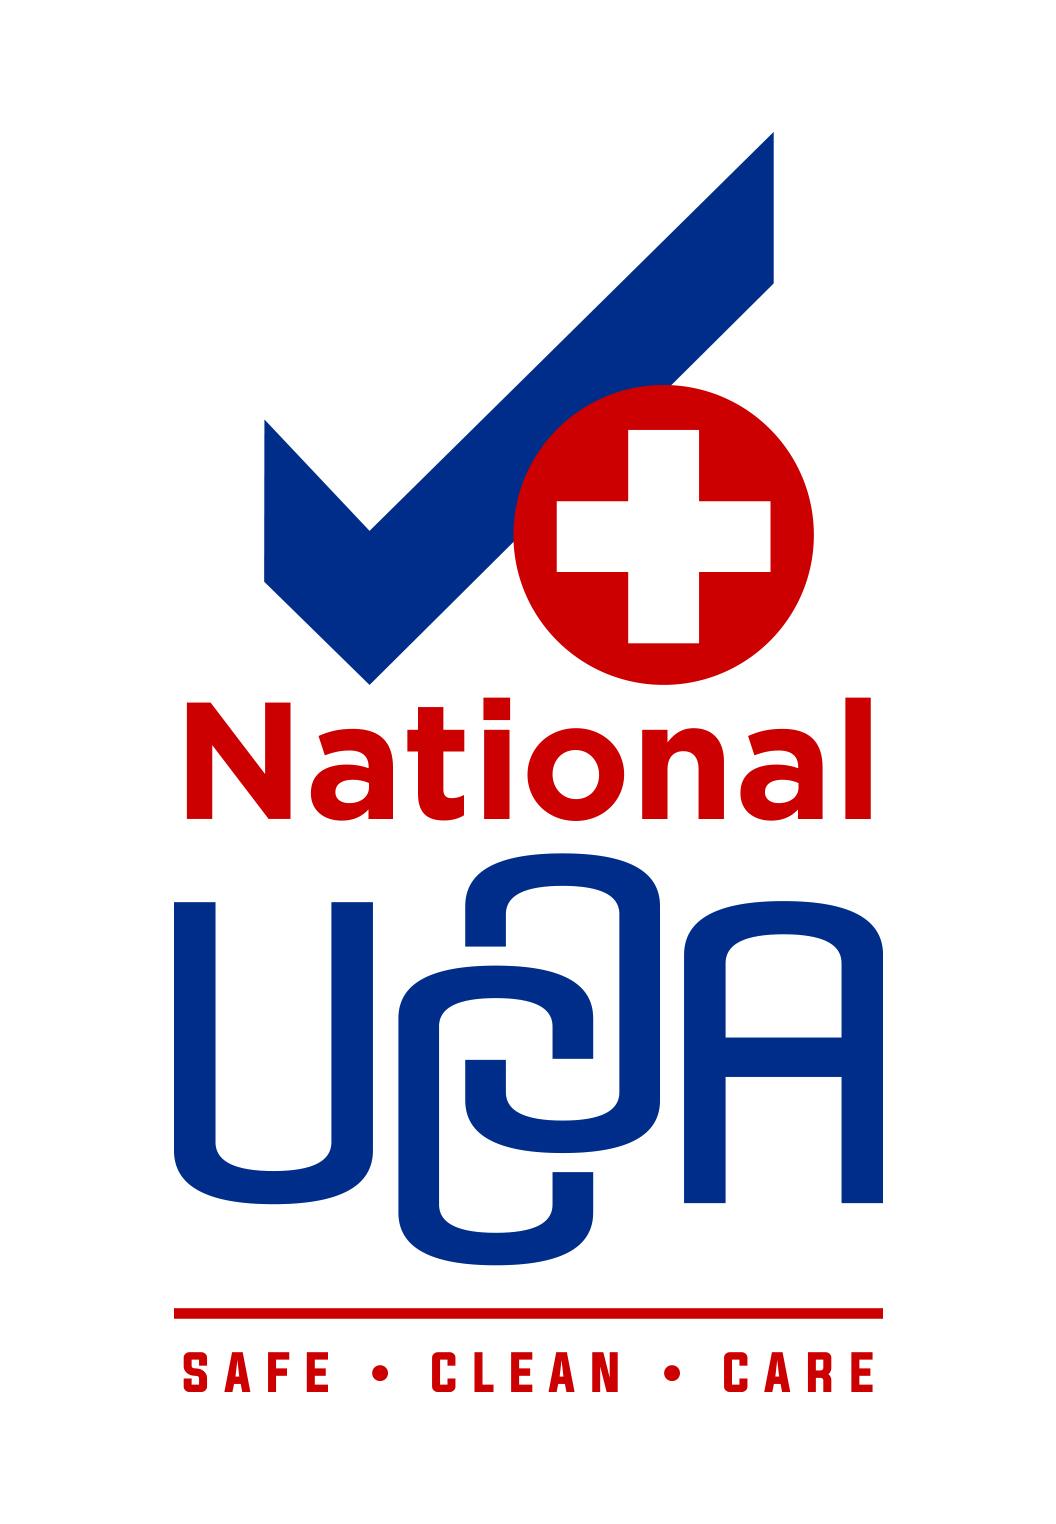 National Urgent Care Center Accreditation